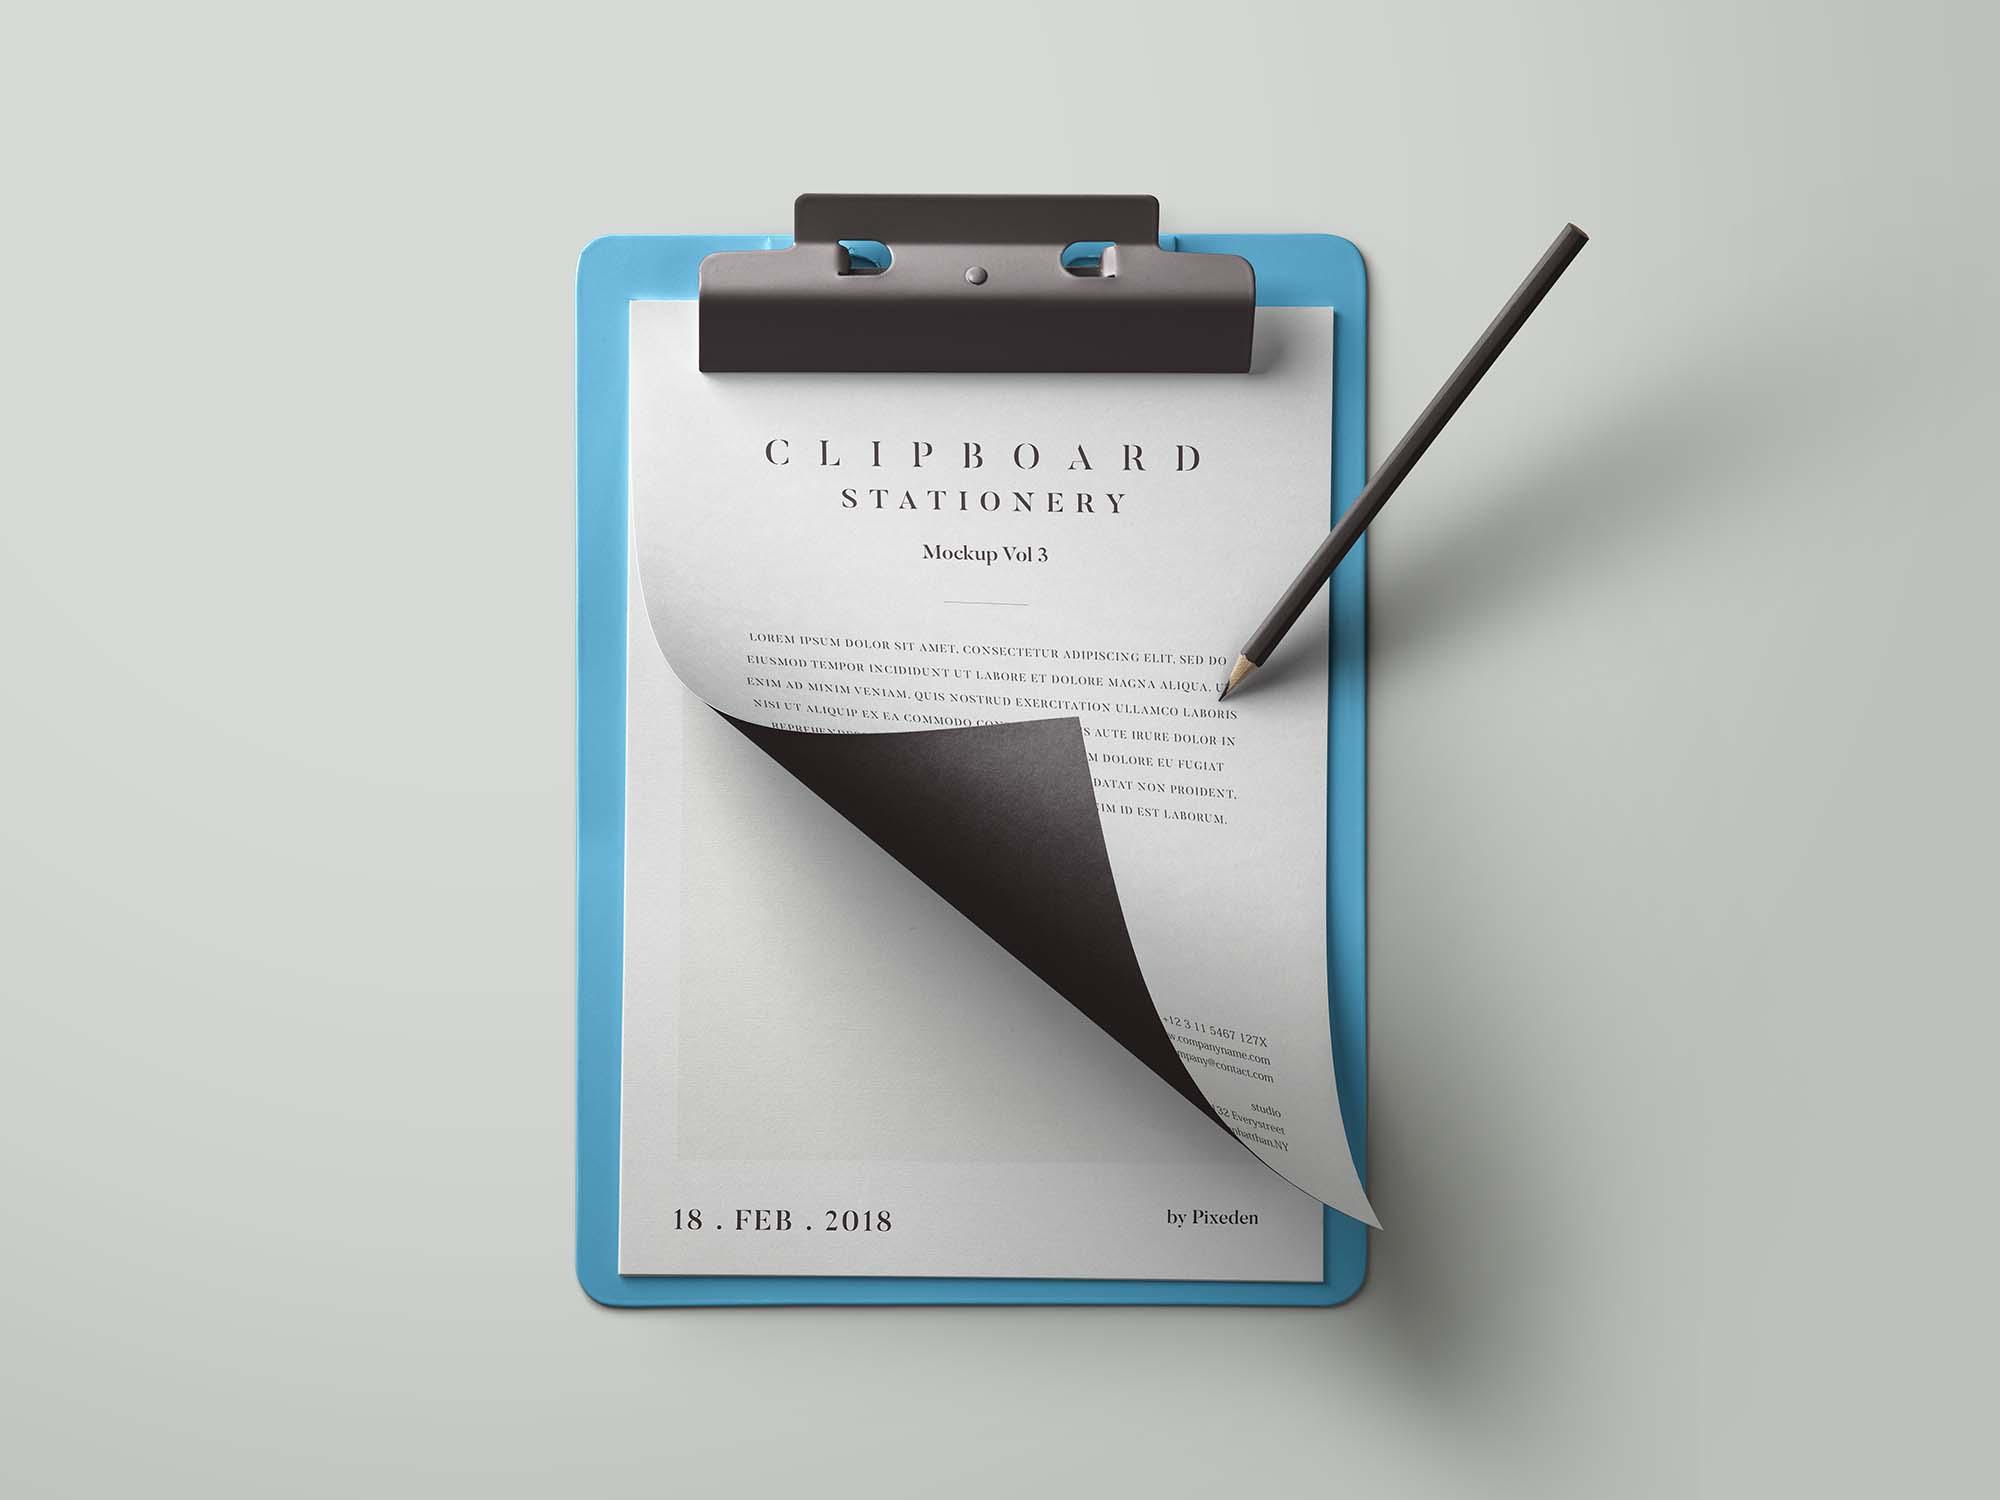 Clipboard Stationery Mockup